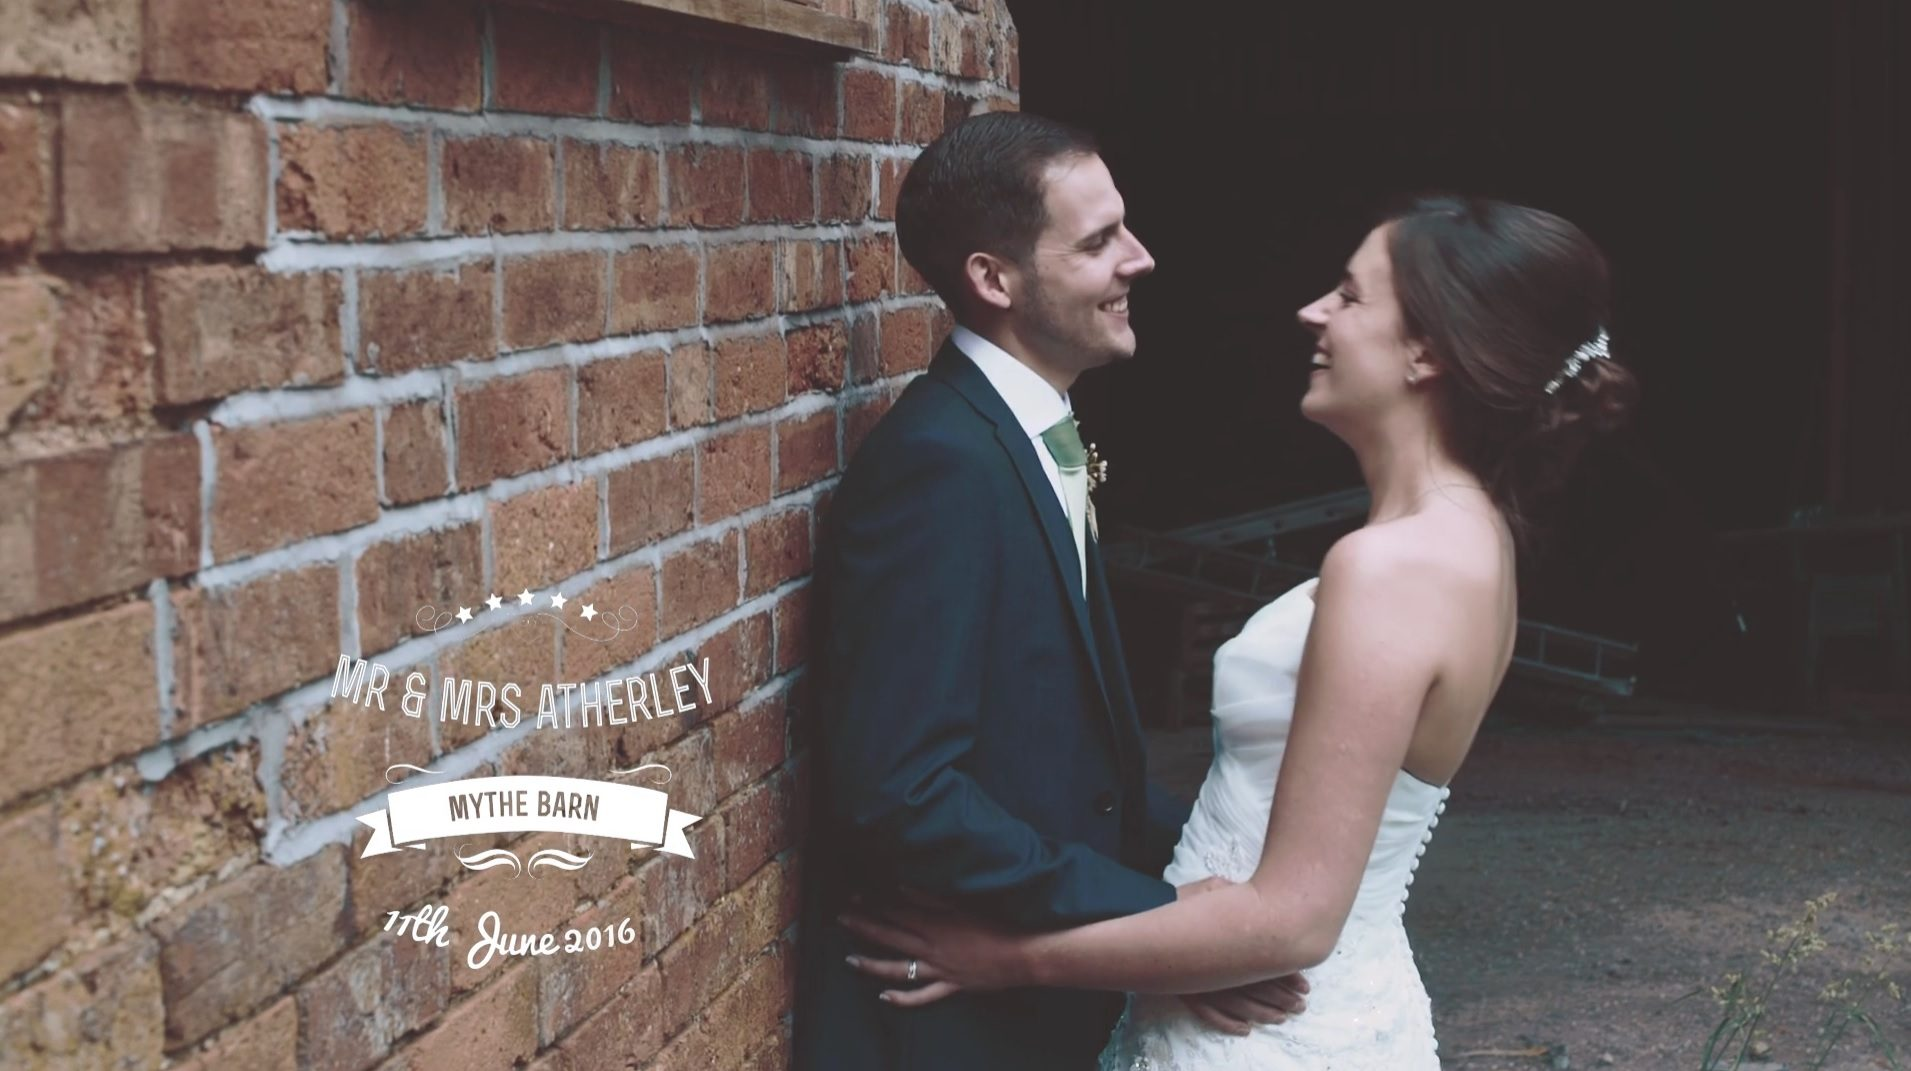 A Gorgeous Wedding at Mythe Barn in Warwickshire